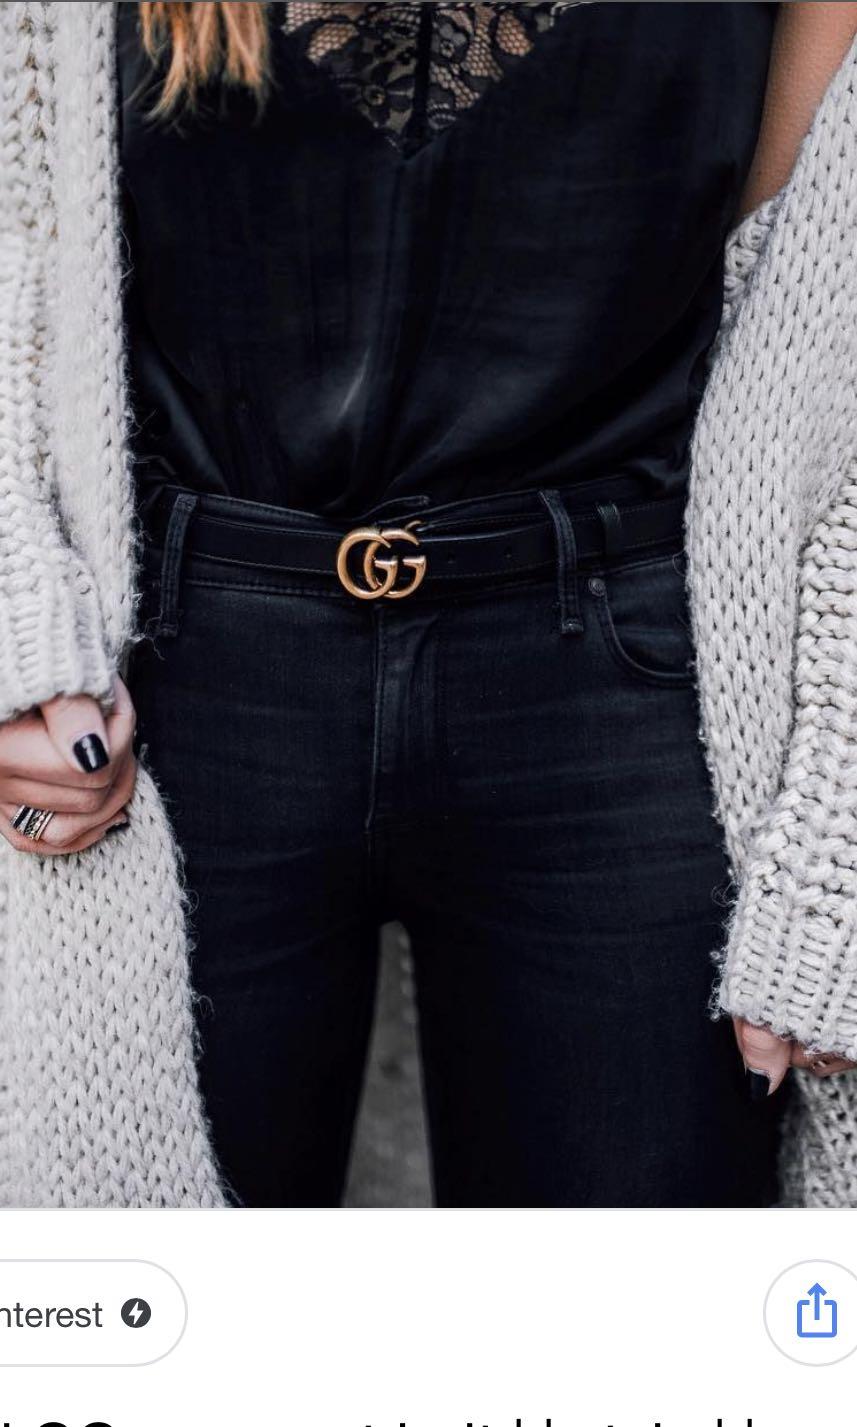 6ddcd9c050c Home · Women s Fashion · Accessories · Belts. photo photo photo